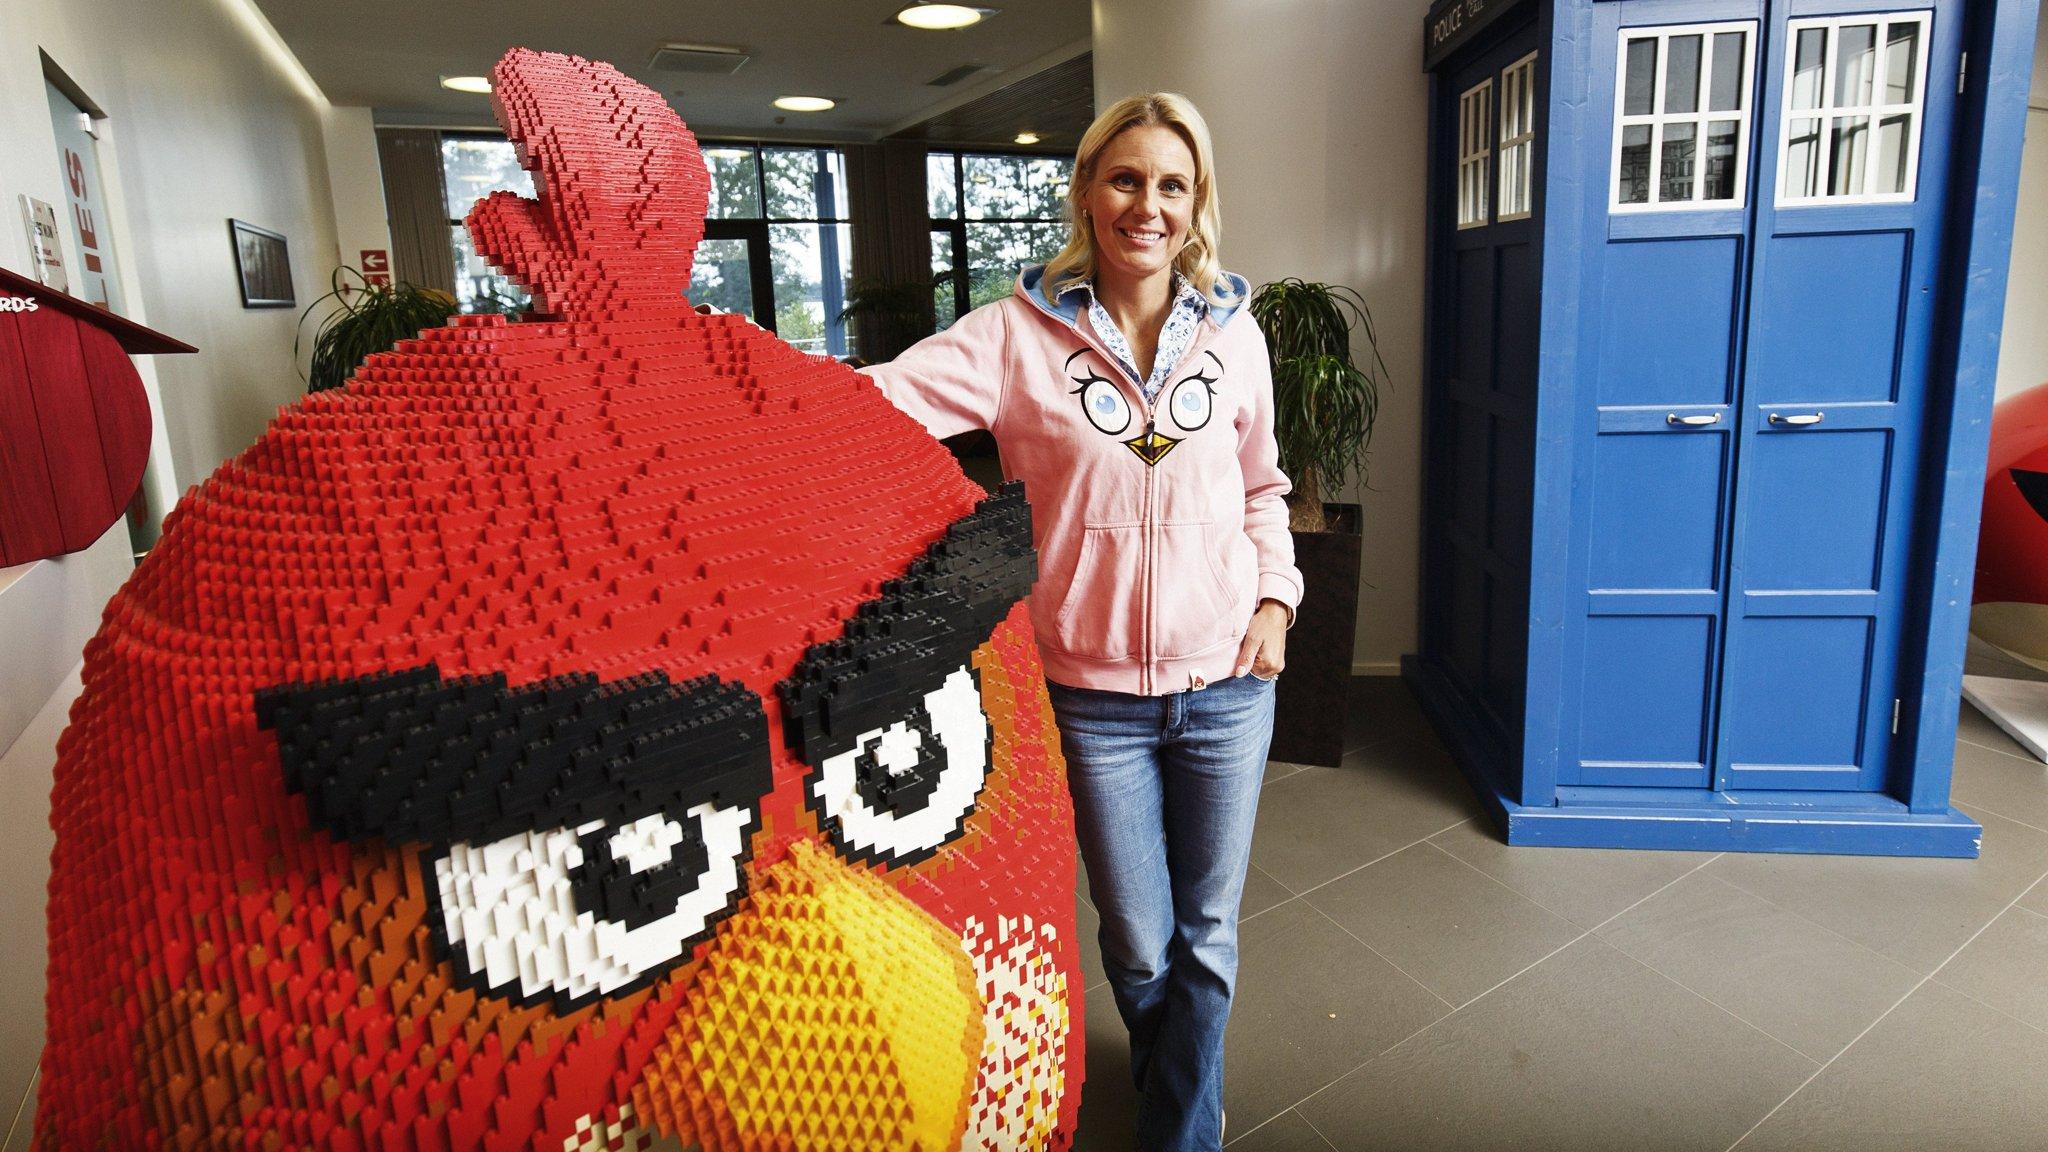 Angry Birds maker Rovio's shares plunge on third-quarter loss